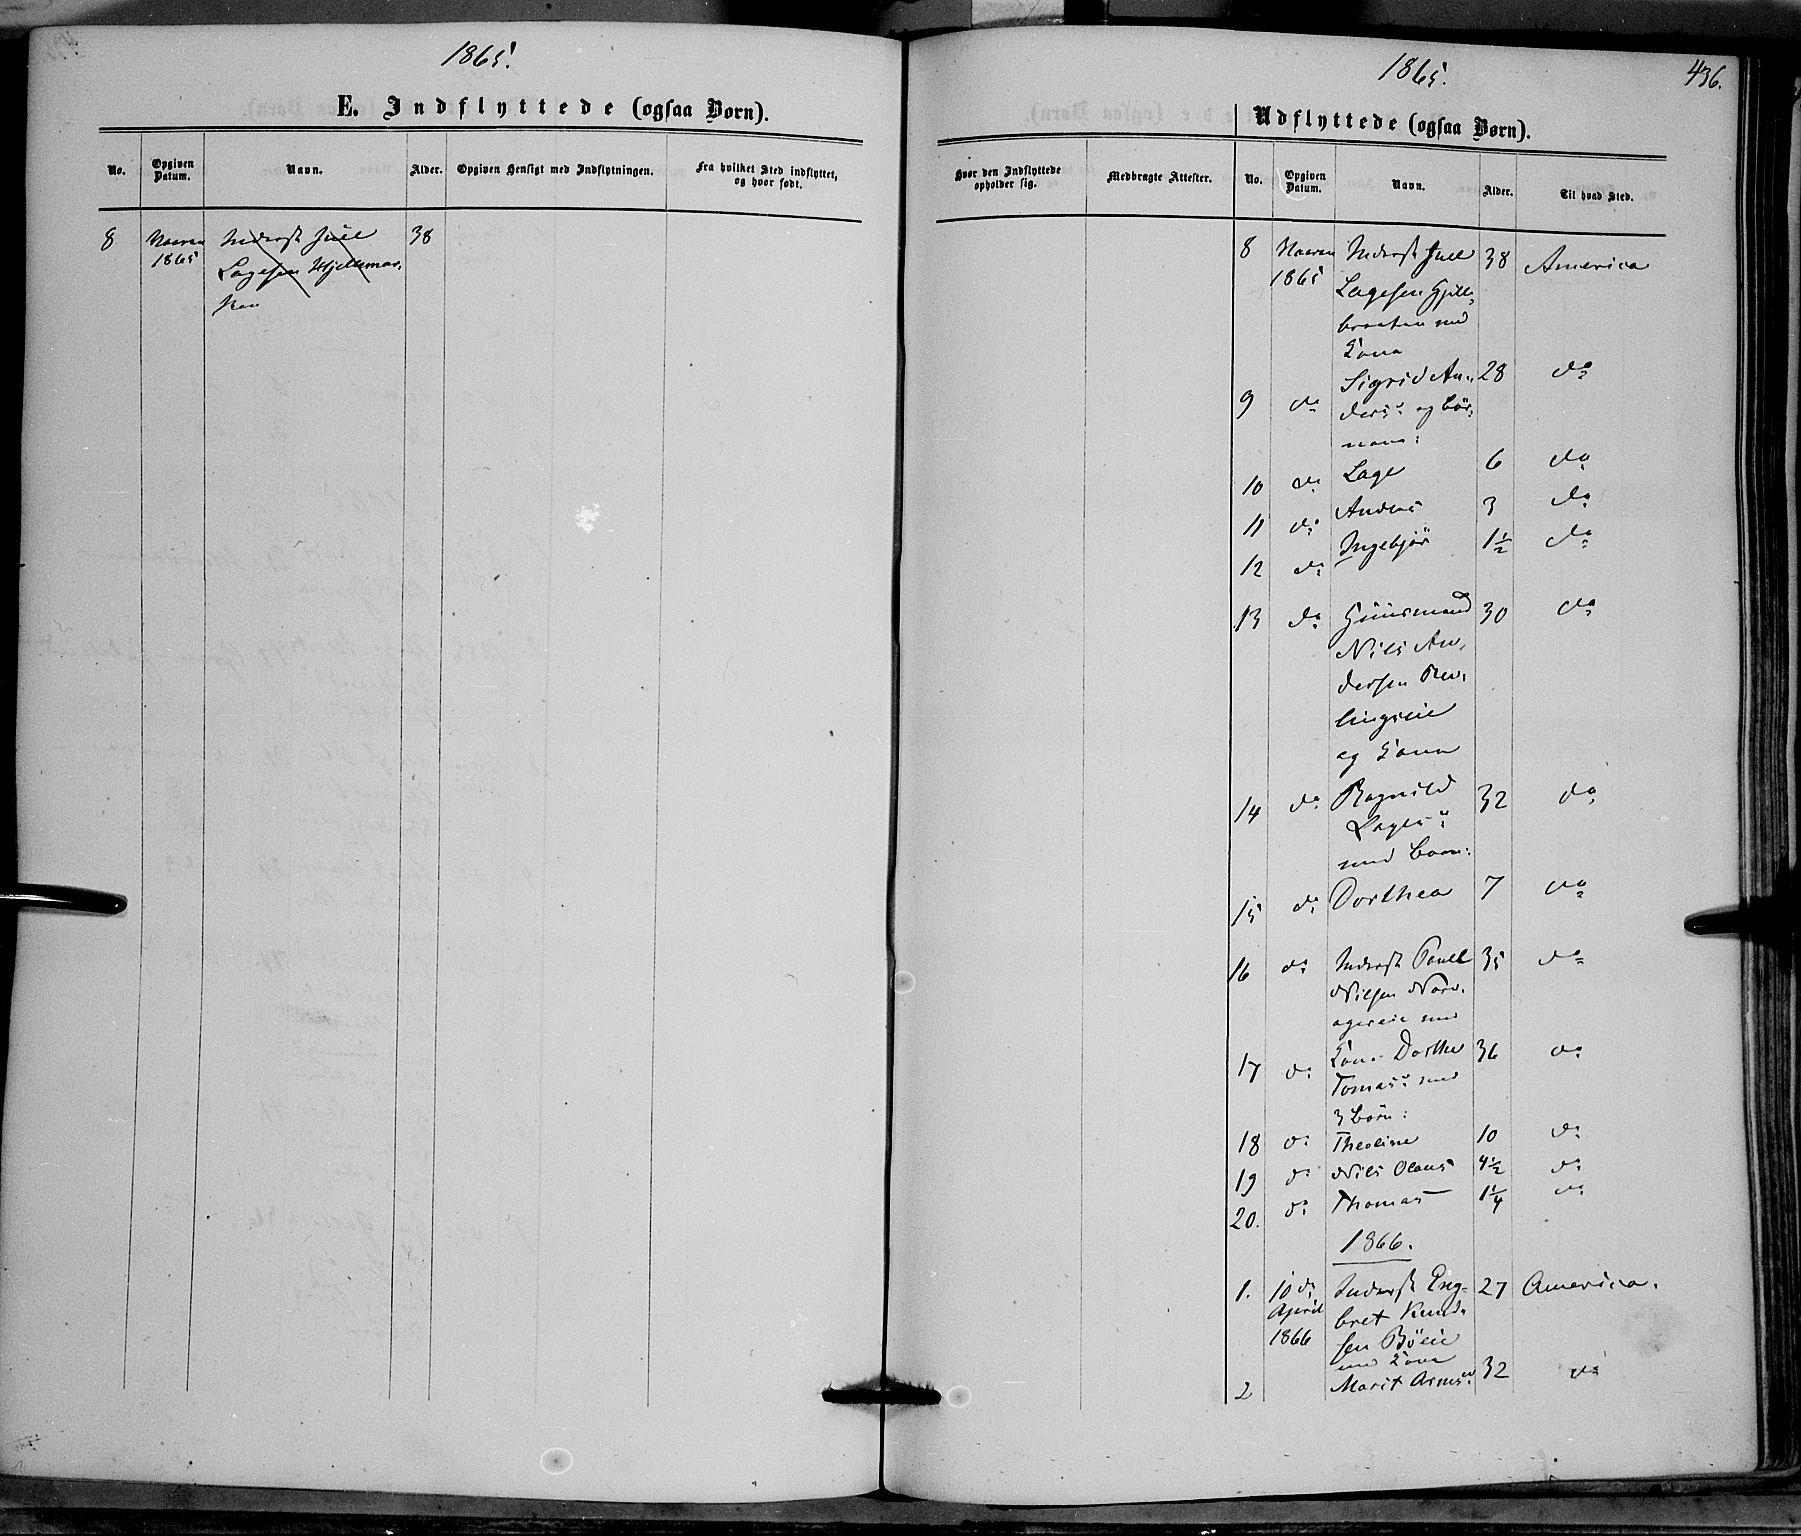 SAH, Nord-Aurdal prestekontor, Ministerialbok nr. 8, 1863-1875, s. 436